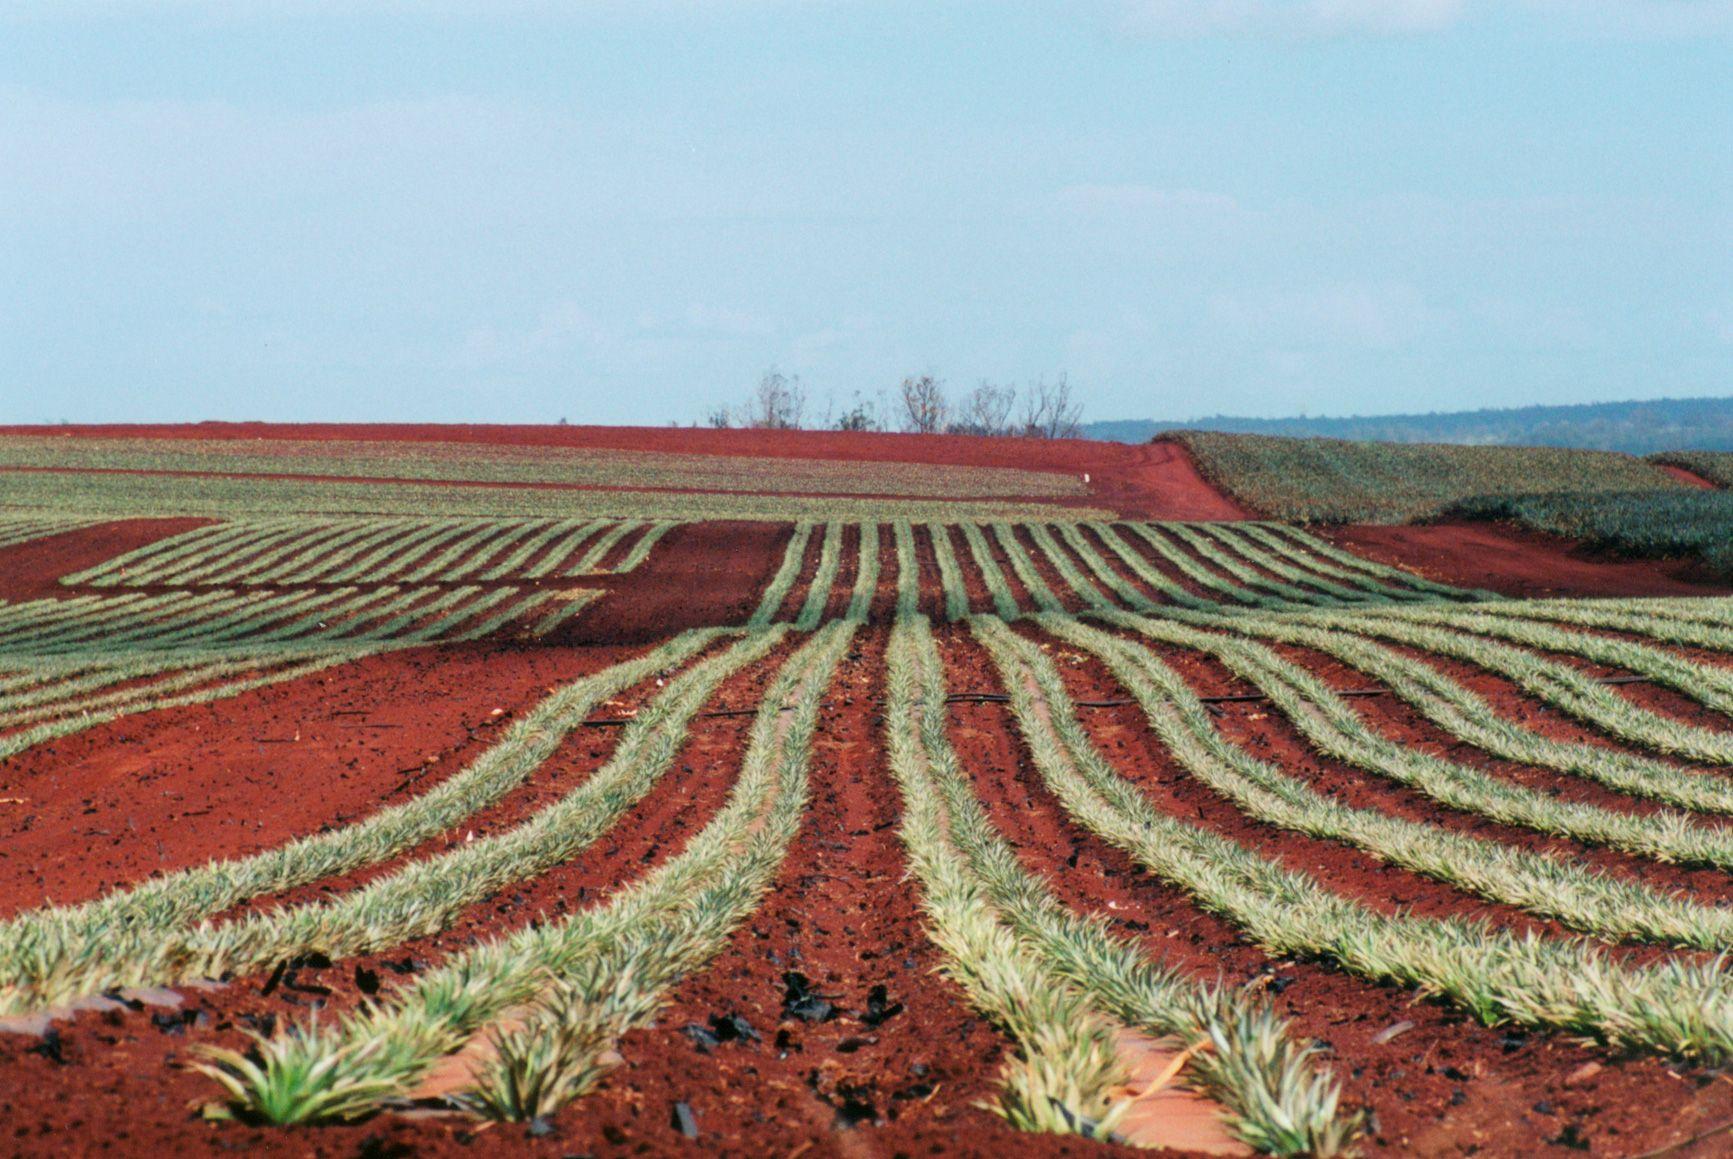 Secrets of Hawaii Central Oahu Pineapple Field Oahu